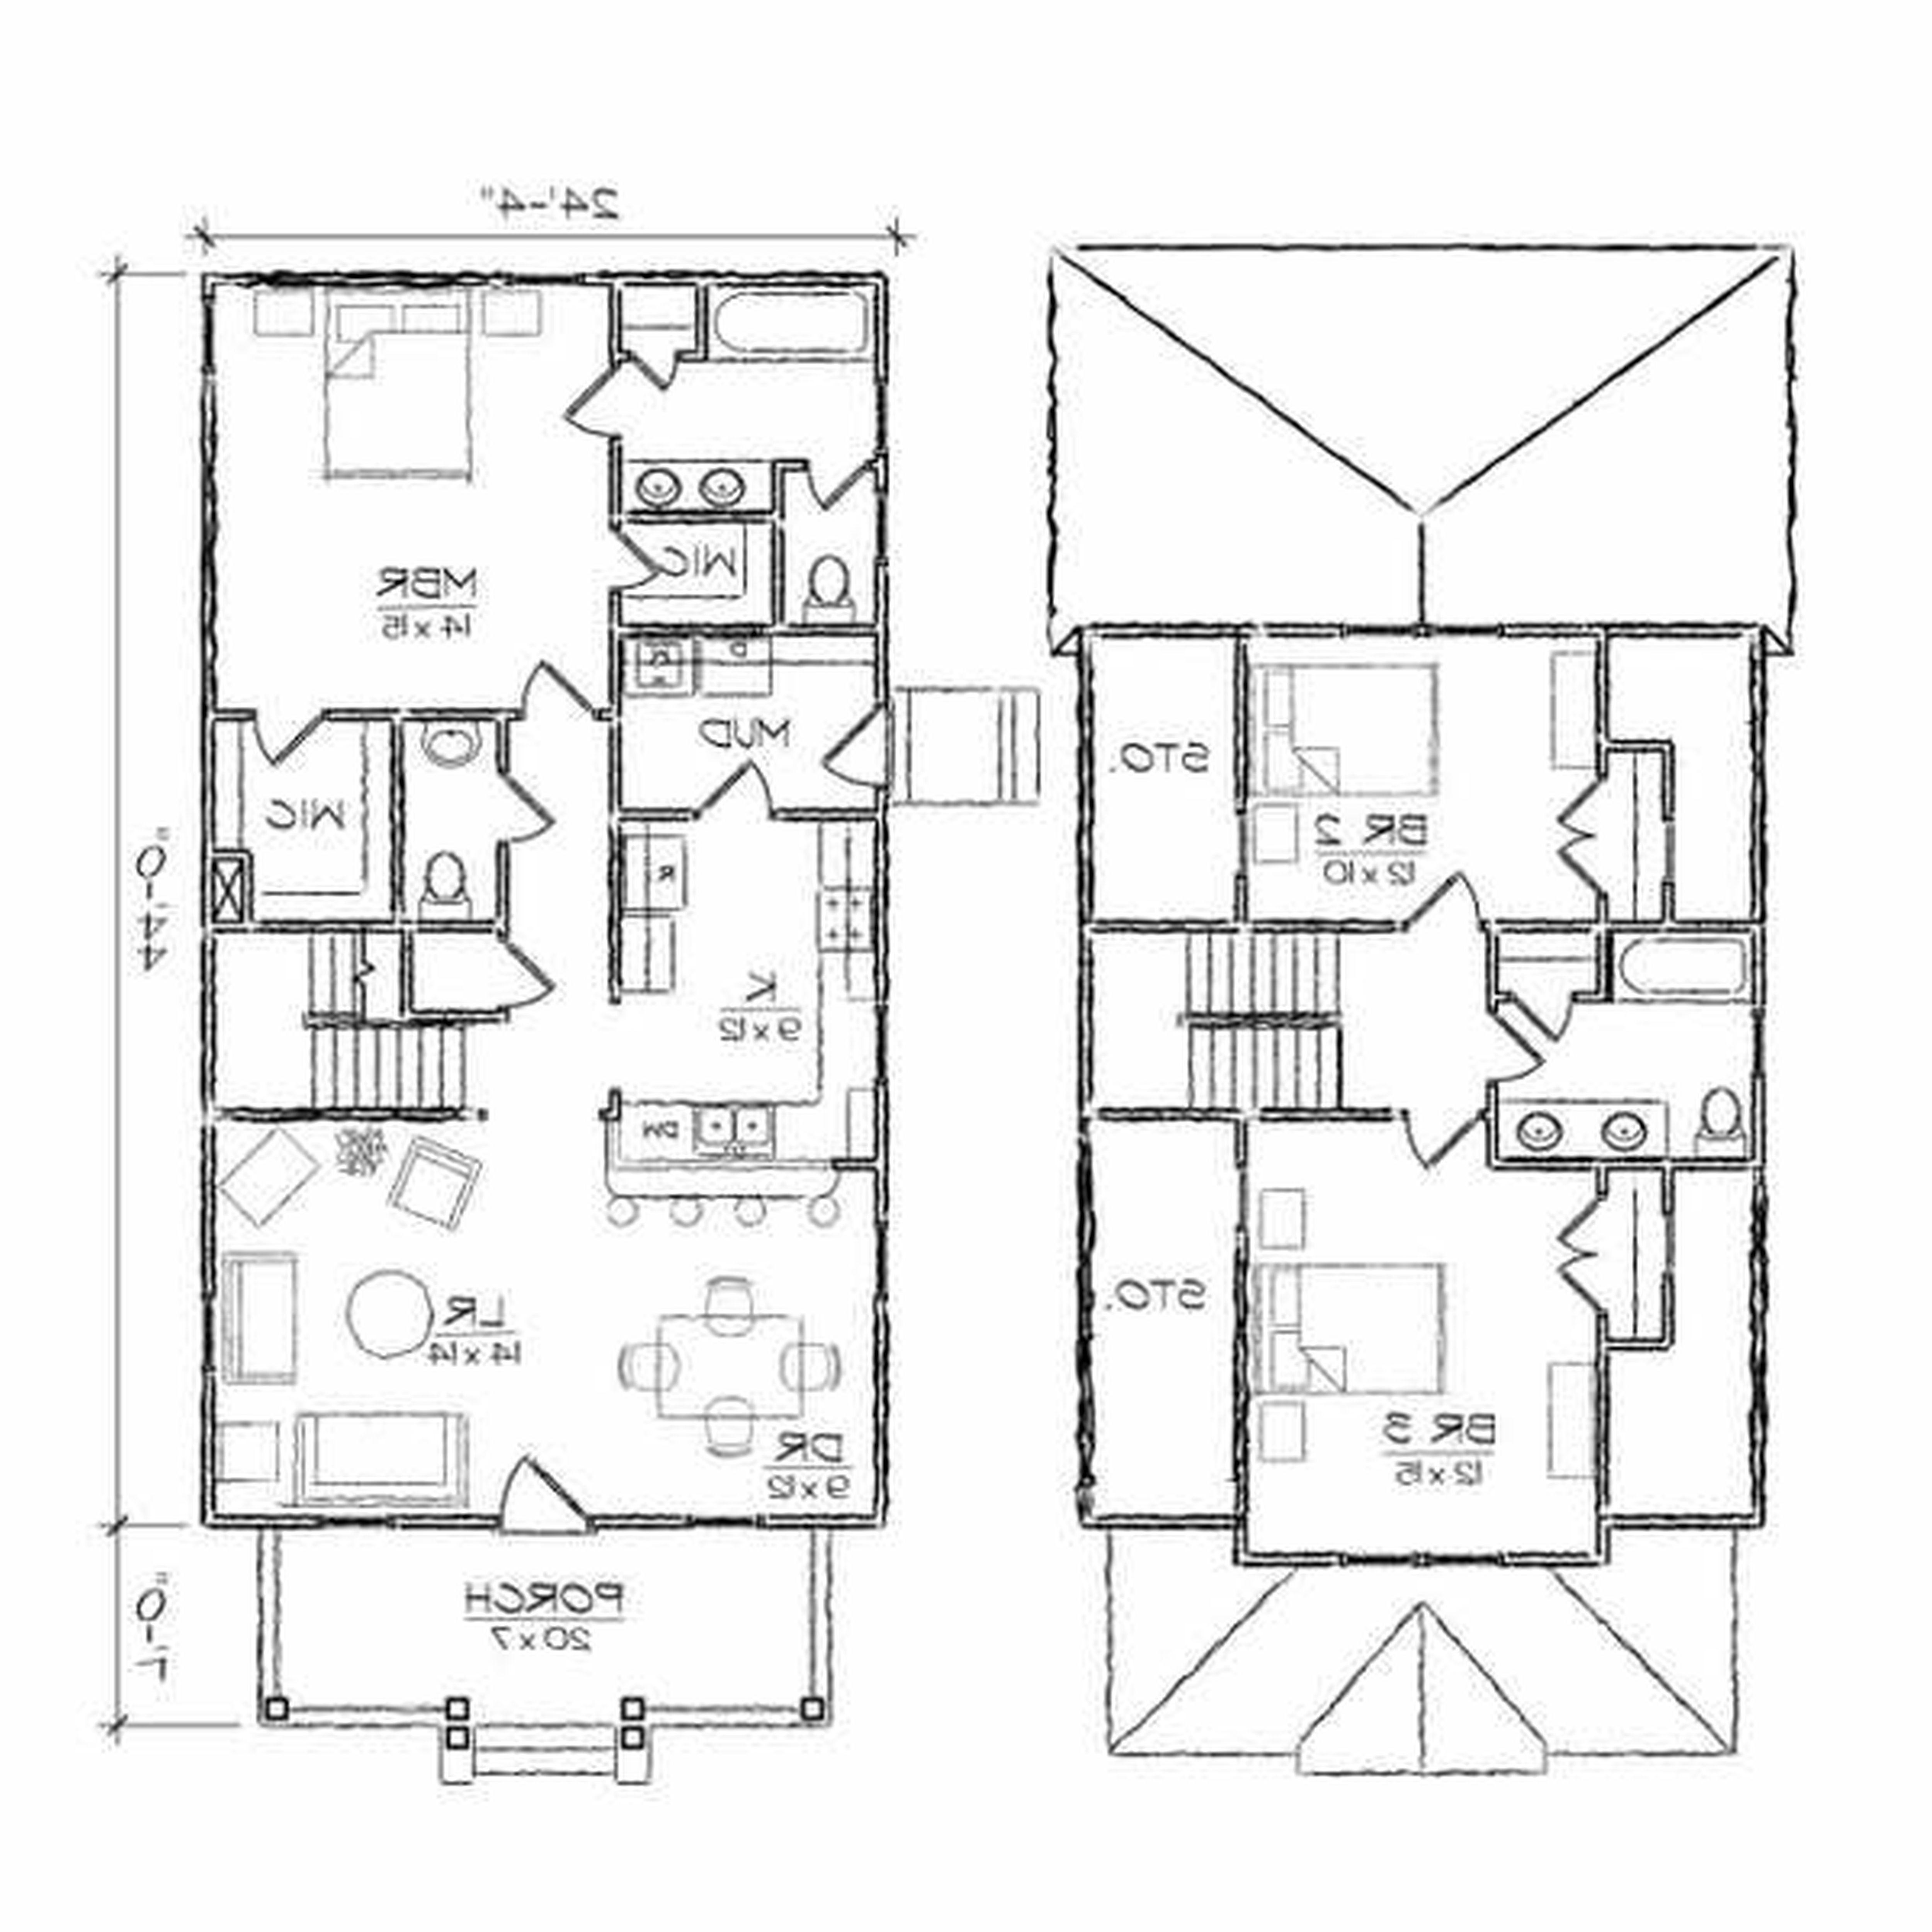 5000x5000 Draw House Floor Plans Free